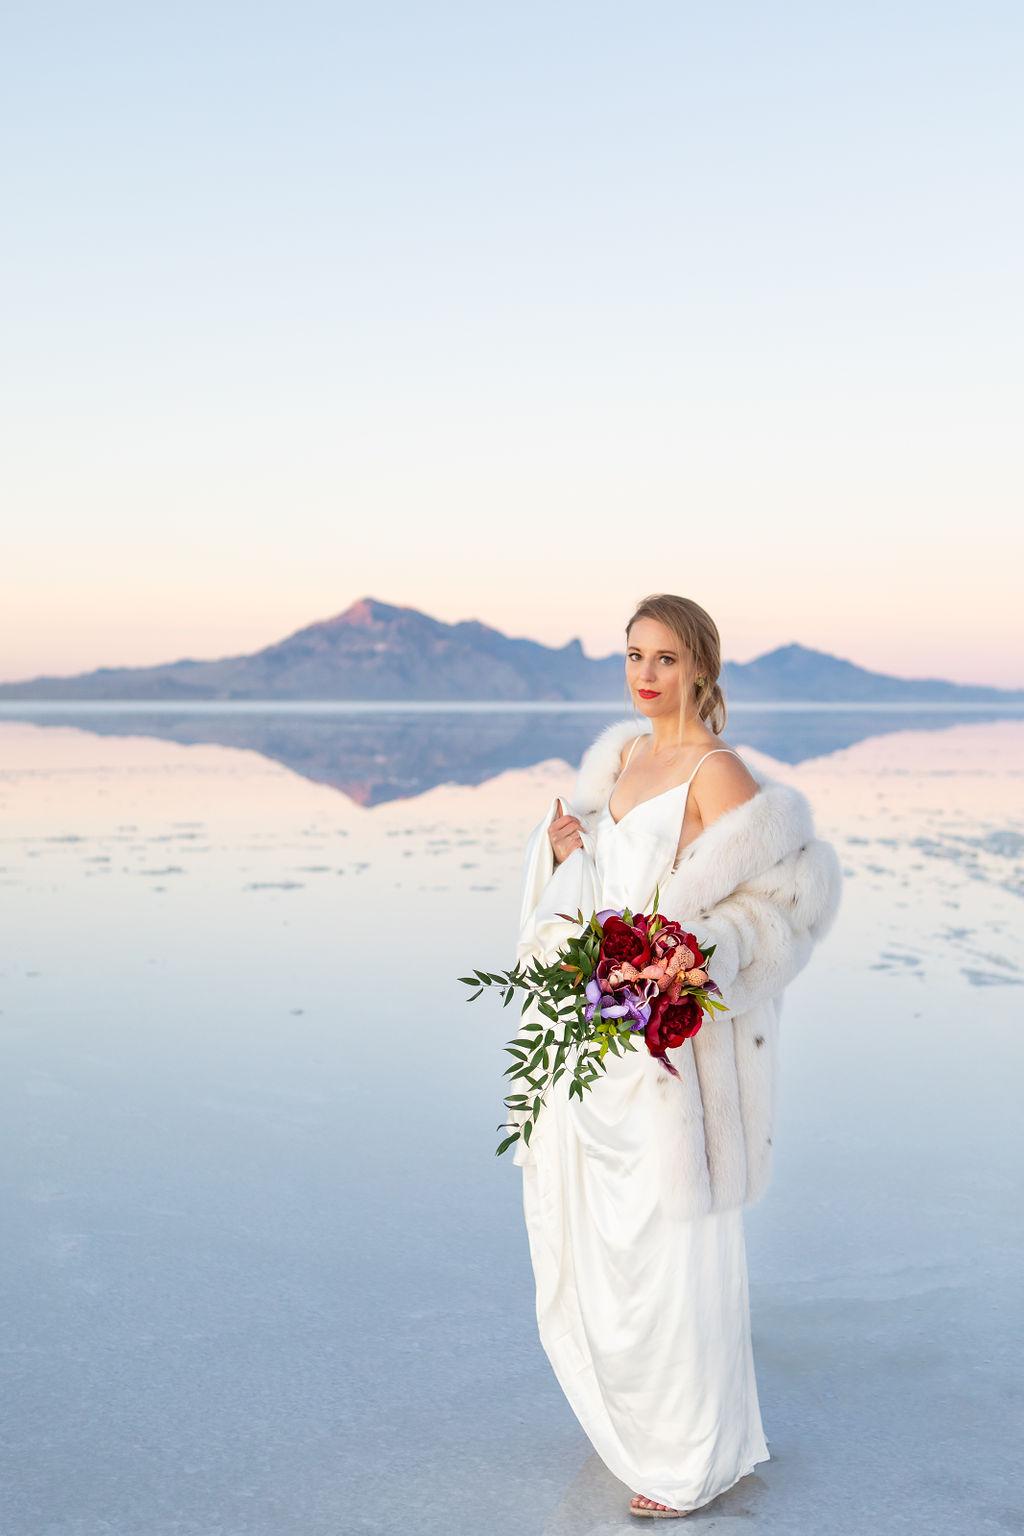 Simple Elegant Modern Goli June Luca Wedding Dress Victoria Chukarov Salt Flats Utah 23